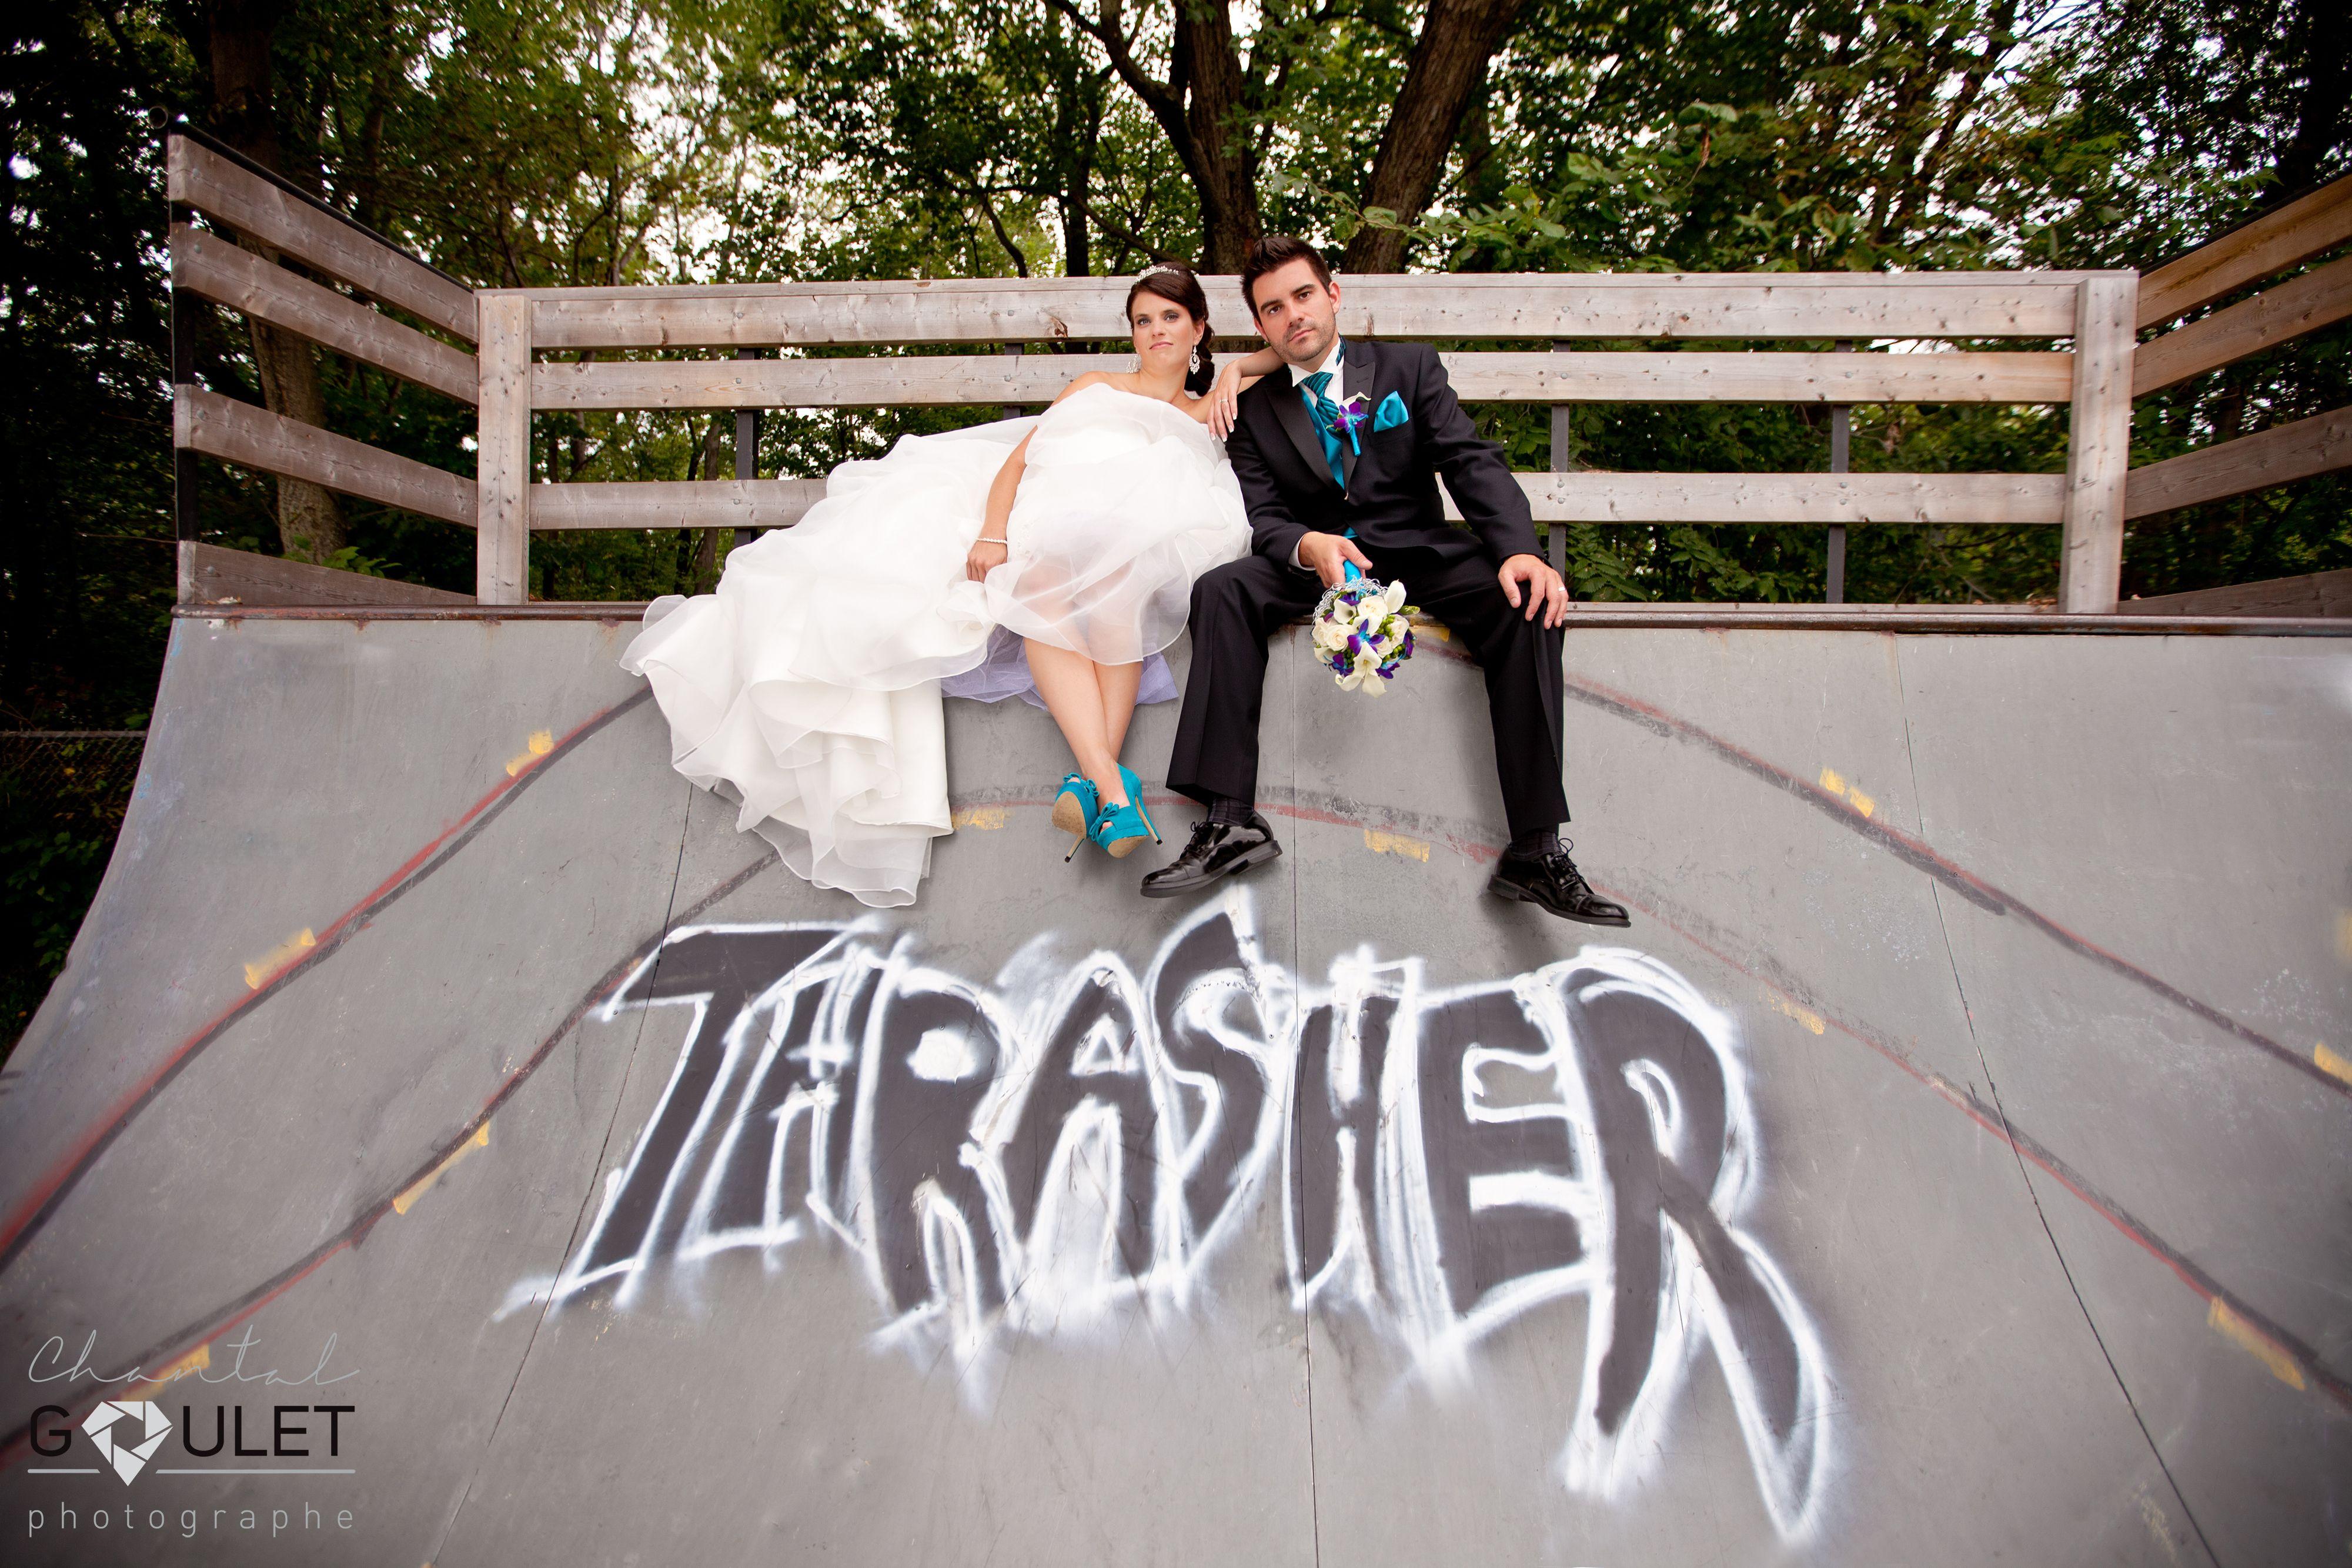 Chantal Goulet Photographe - Trash - Mariage